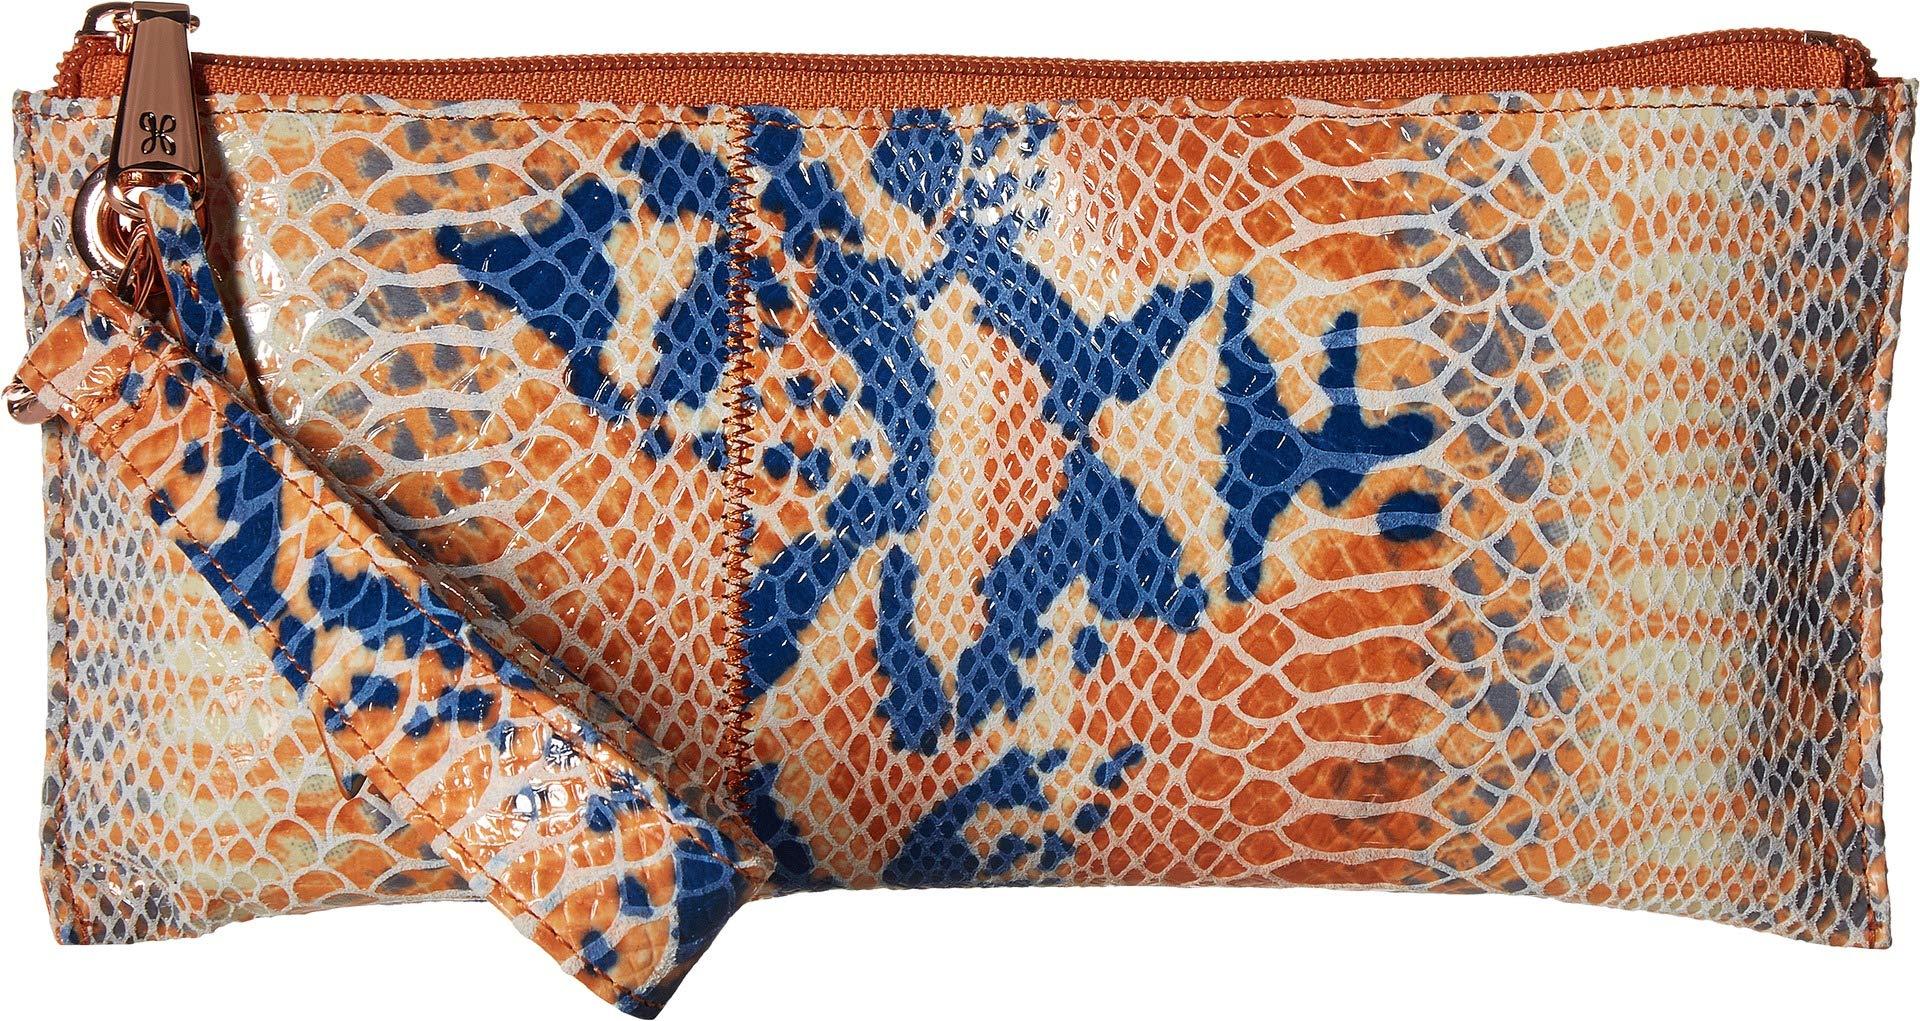 Hobo Womens Leather Vintage Vida Clutch Wallet (Adobe Snake)